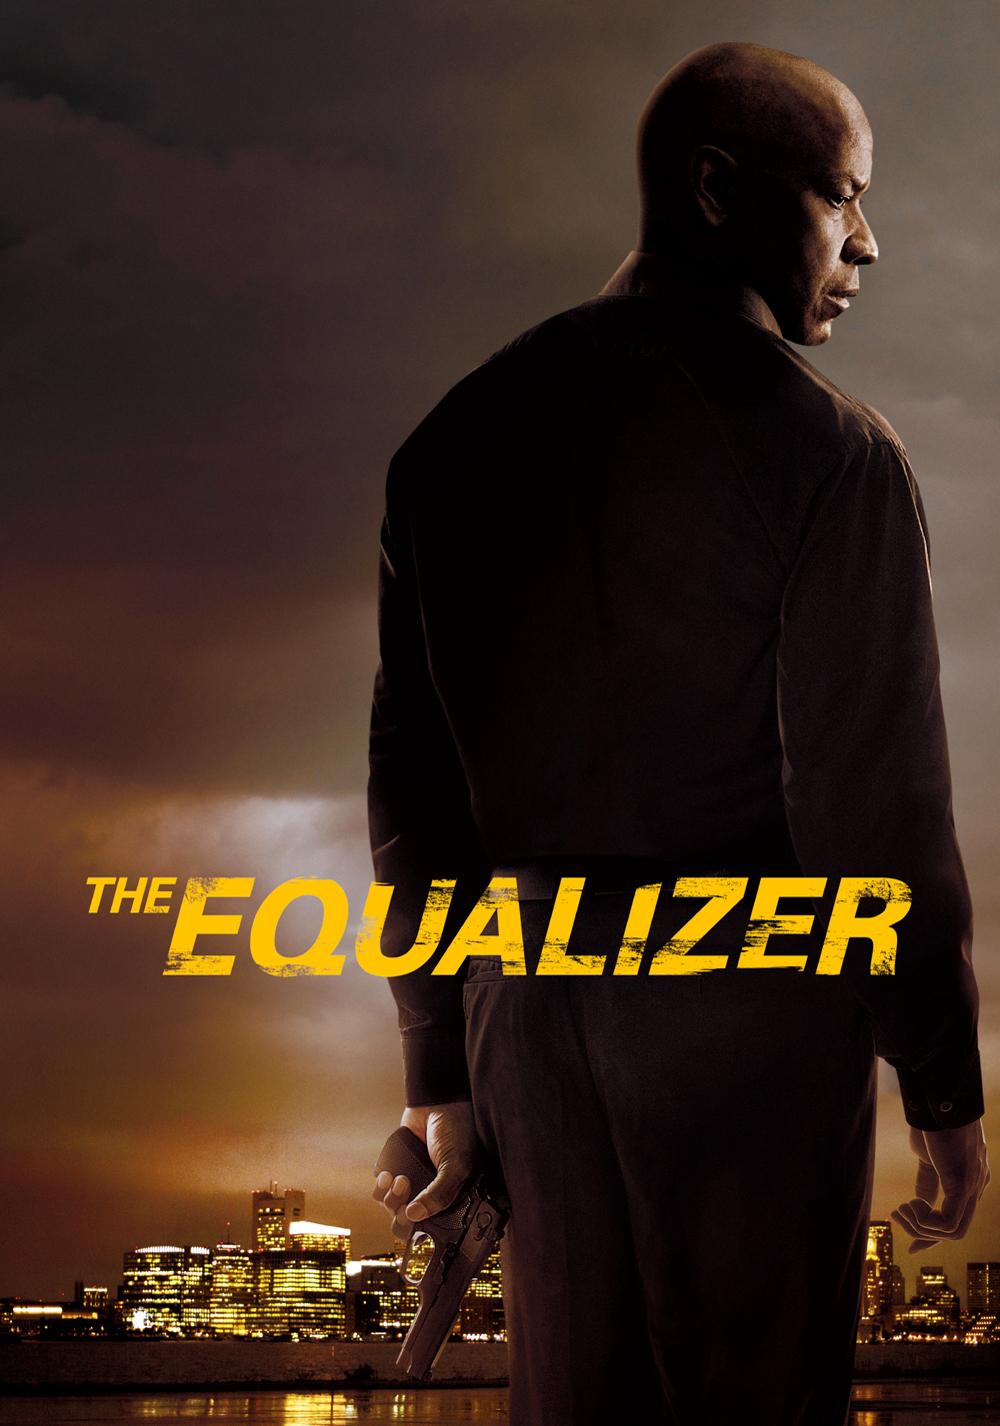 The Equalizer Film